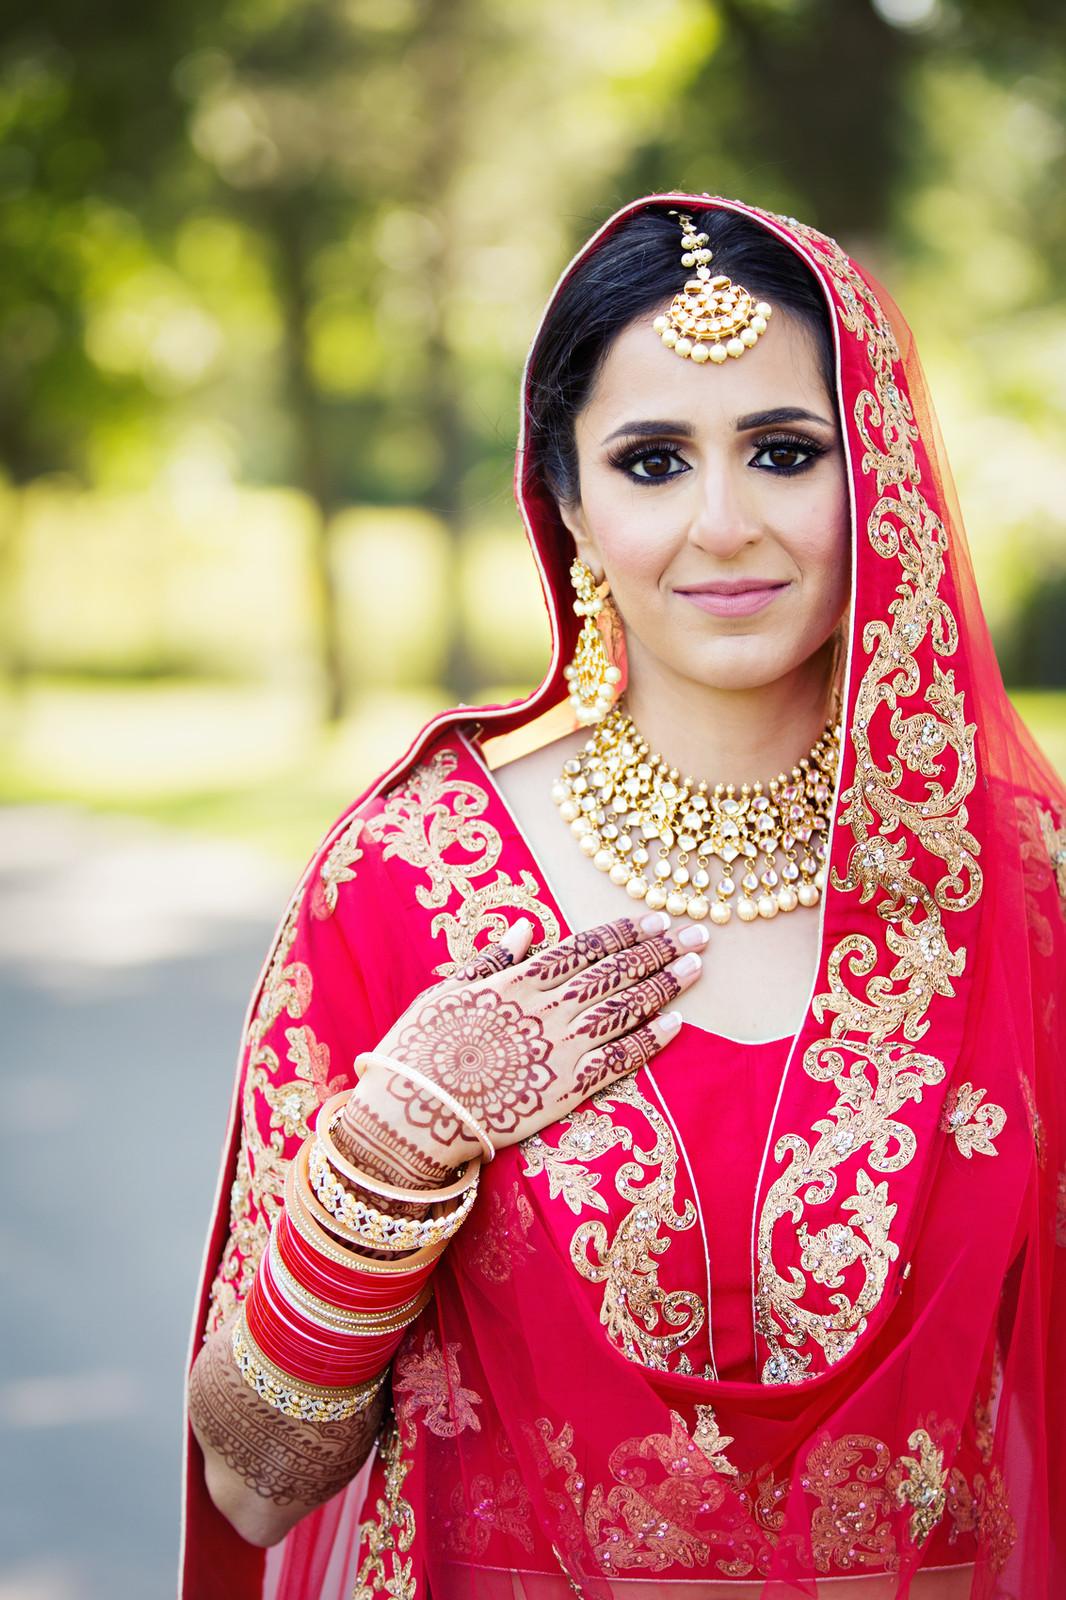 Indian bride, London Ontario. Pakistani makeup, hair and styling